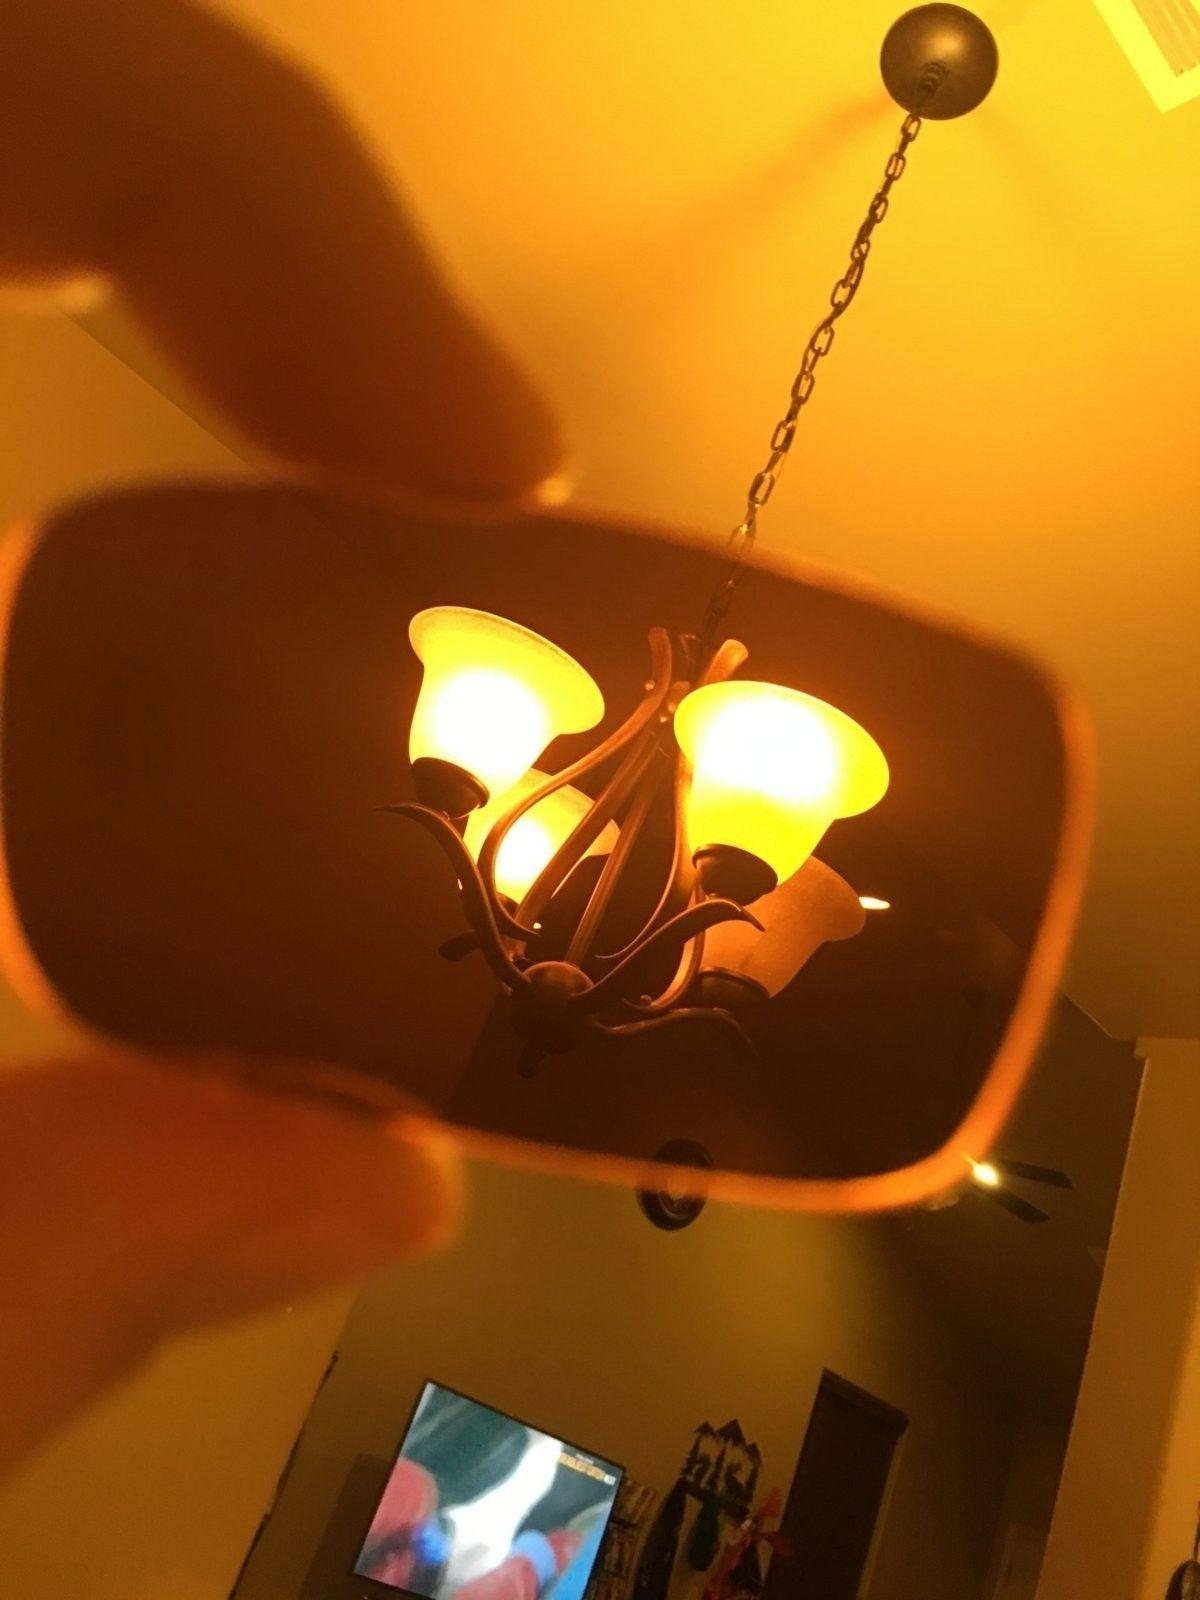 XS VR28 lenses *$75* - image.jpeg